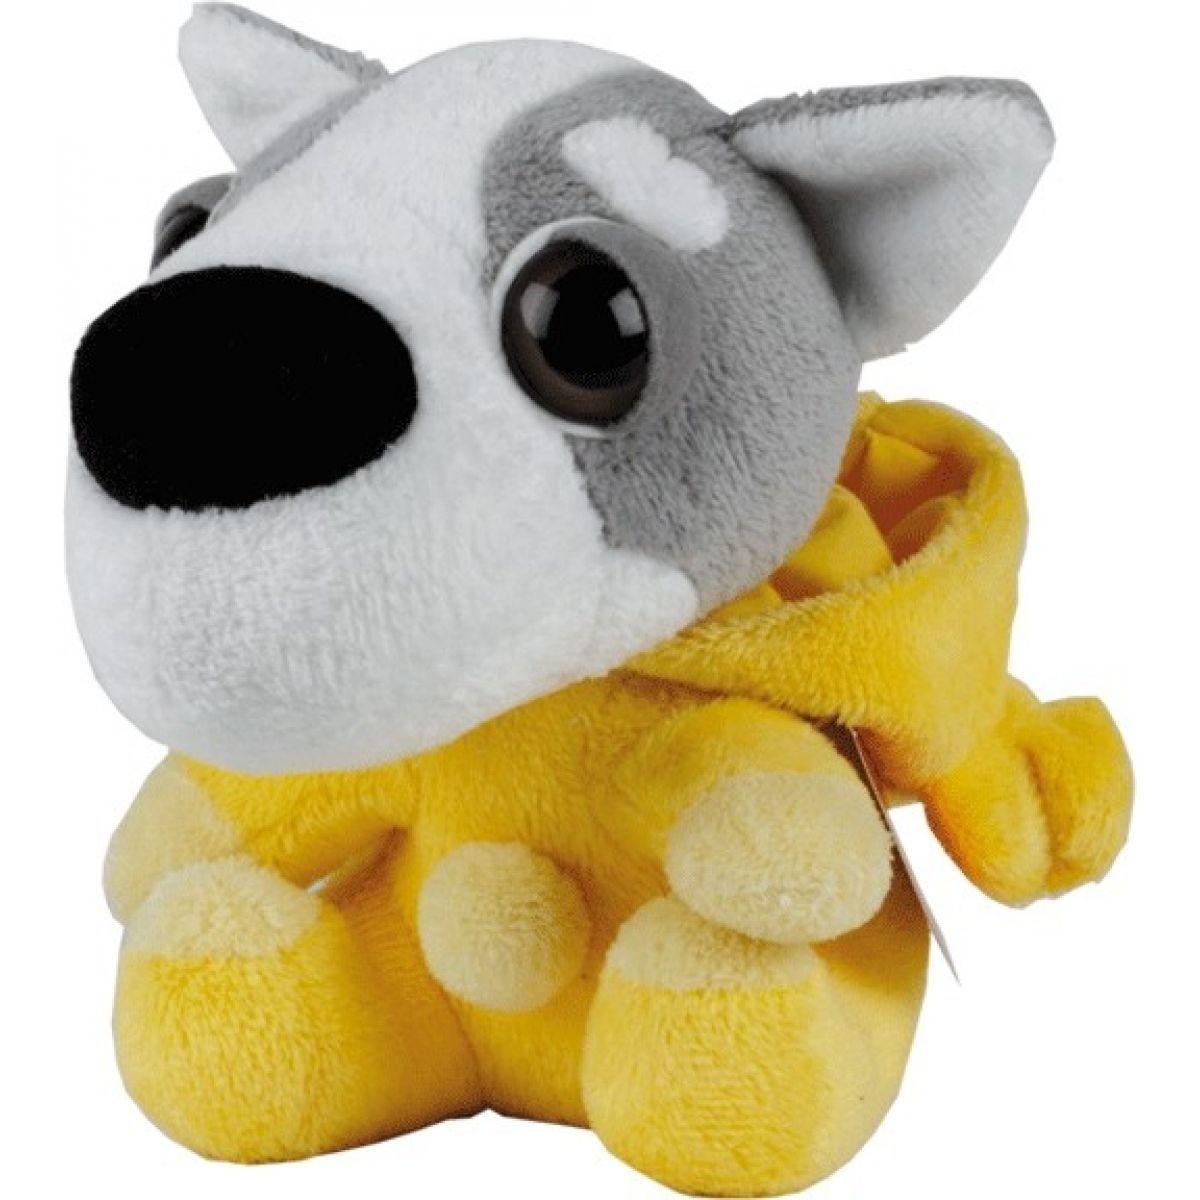 EP Line The Dog baby 15 cm - Husky